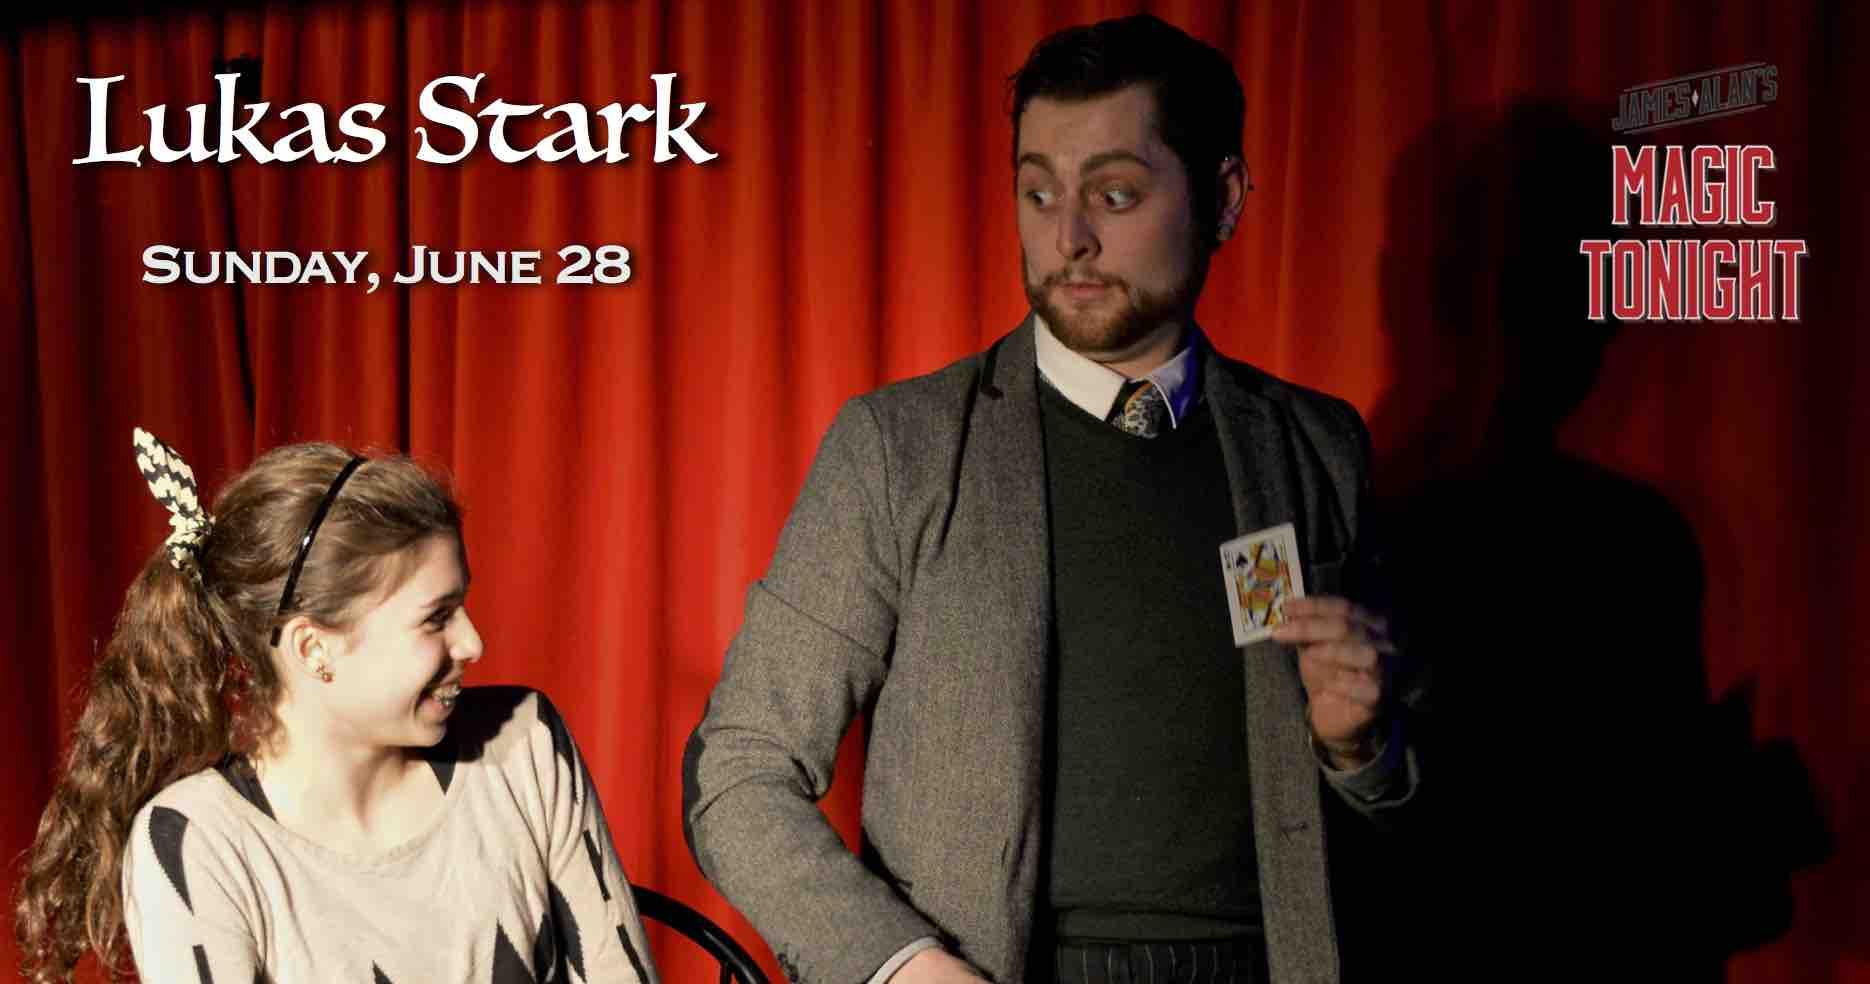 June 28 Lukas Stark